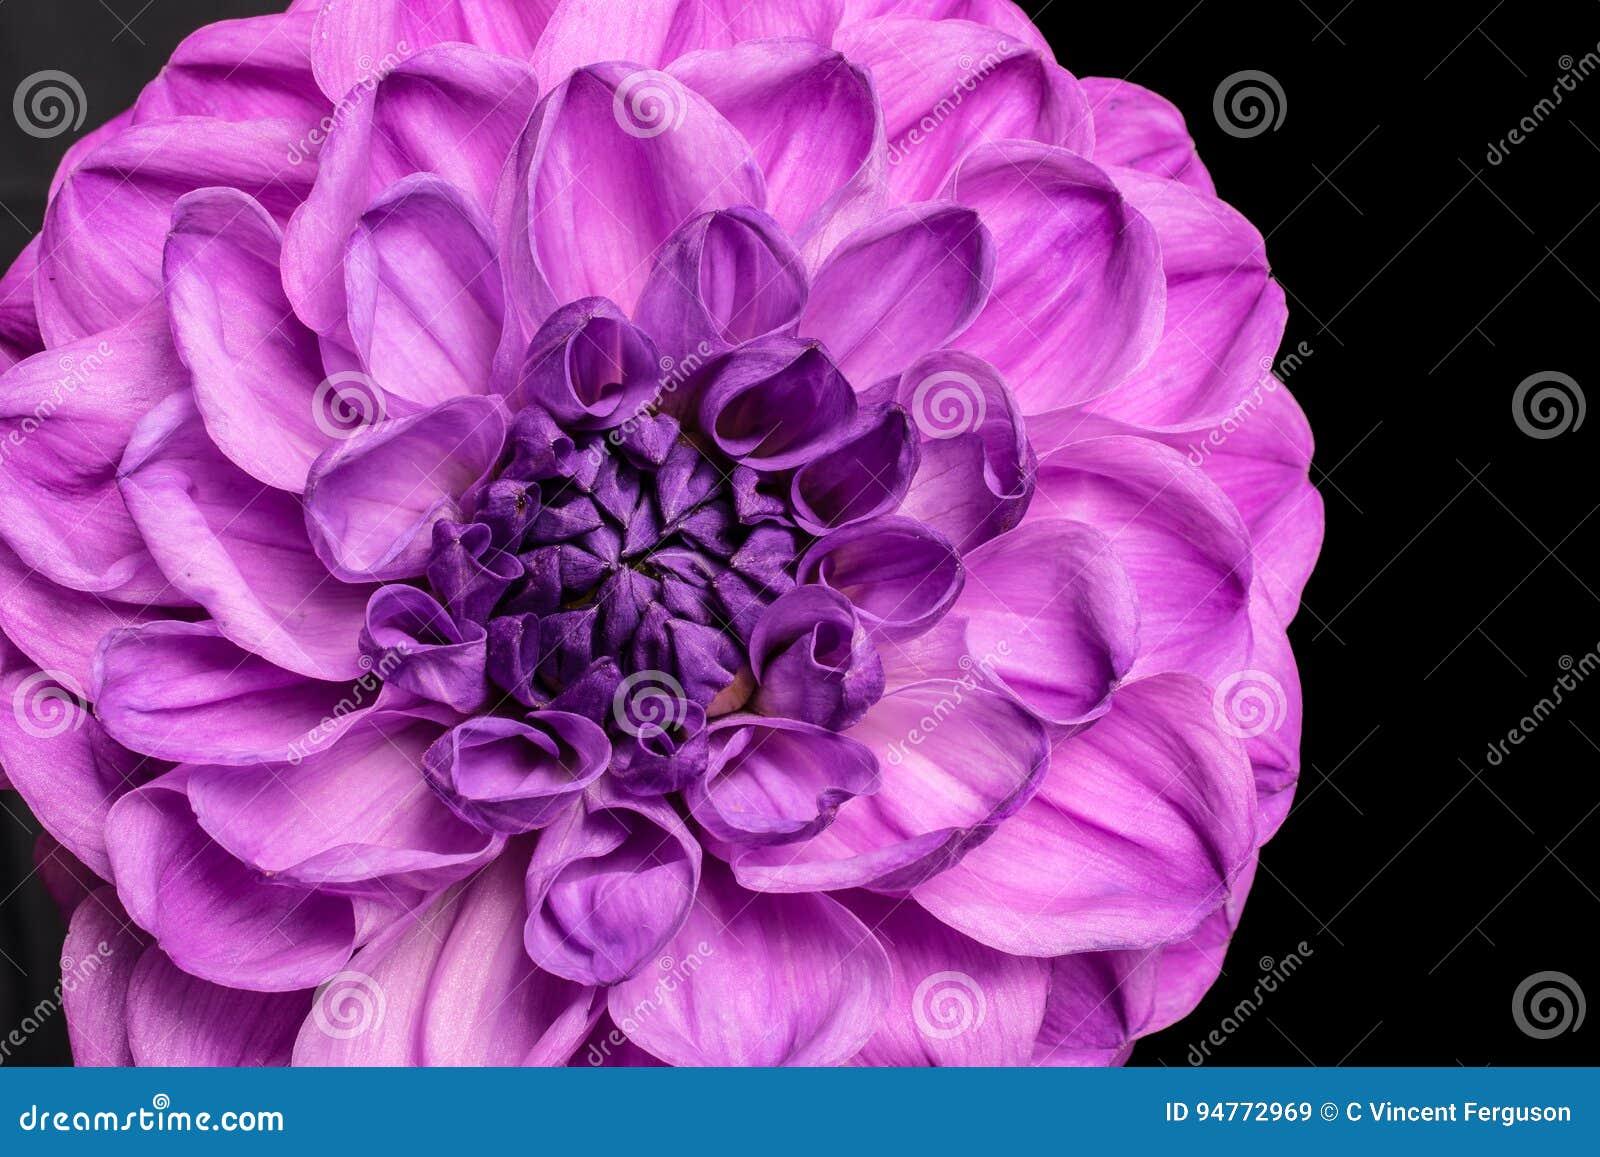 Purple dahlia flower stock image image of dark flora 94772969 download purple dahlia flower stock image image of dark flora 94772969 izmirmasajfo